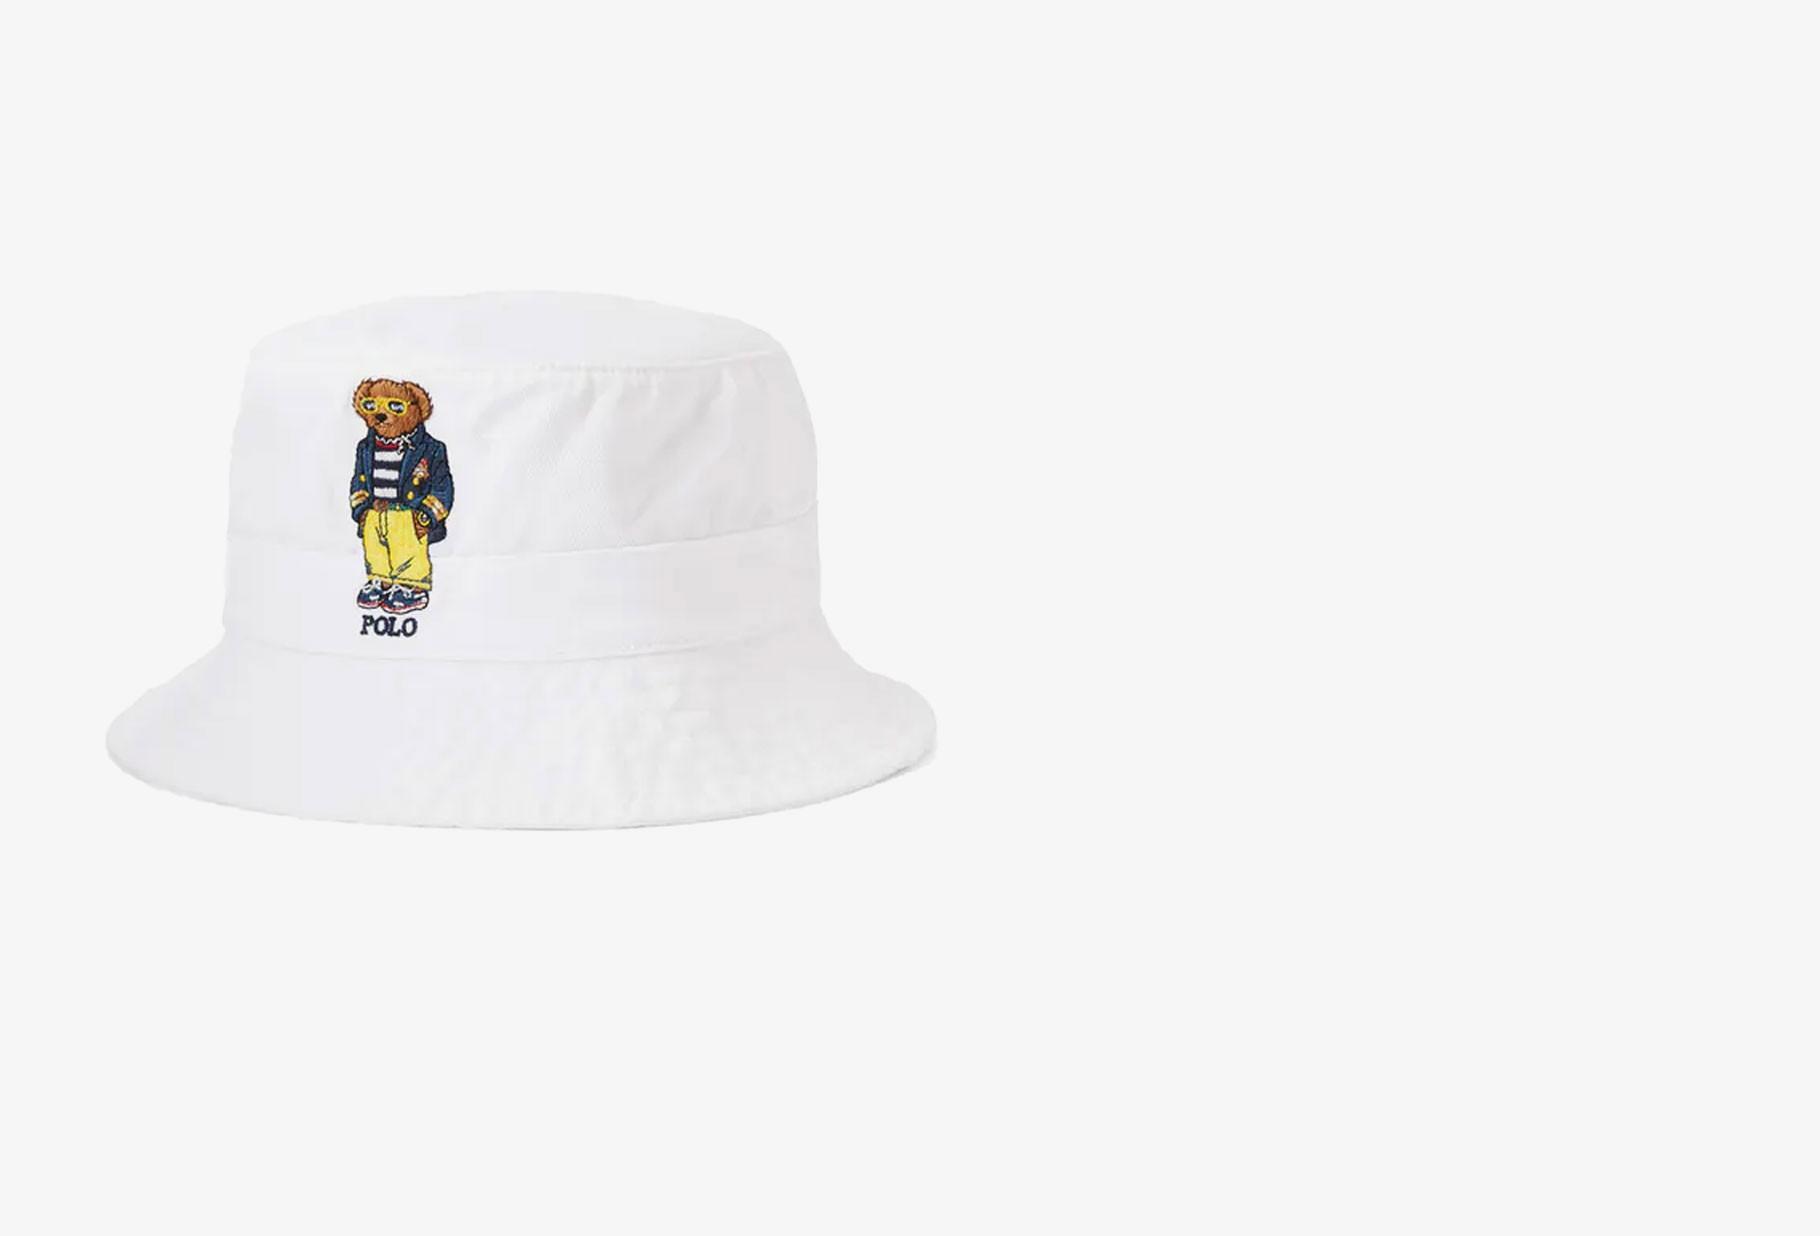 POLO RALPH LAUREN / Loft bucket hat polo bear White